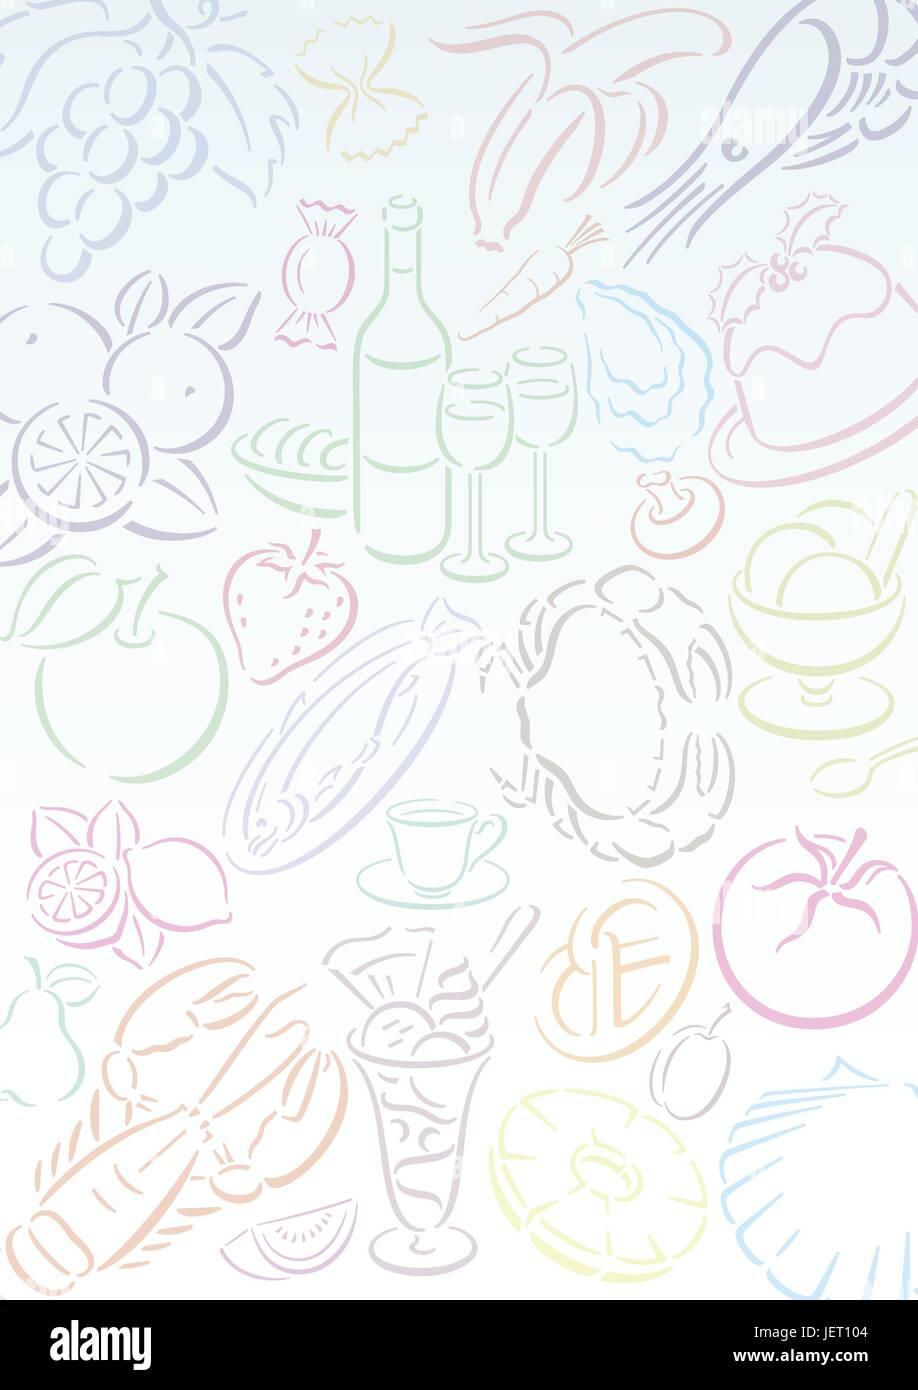 food, aliment, restaurant, food, aliment, progenies, fruits, illustration, - Stock Vector